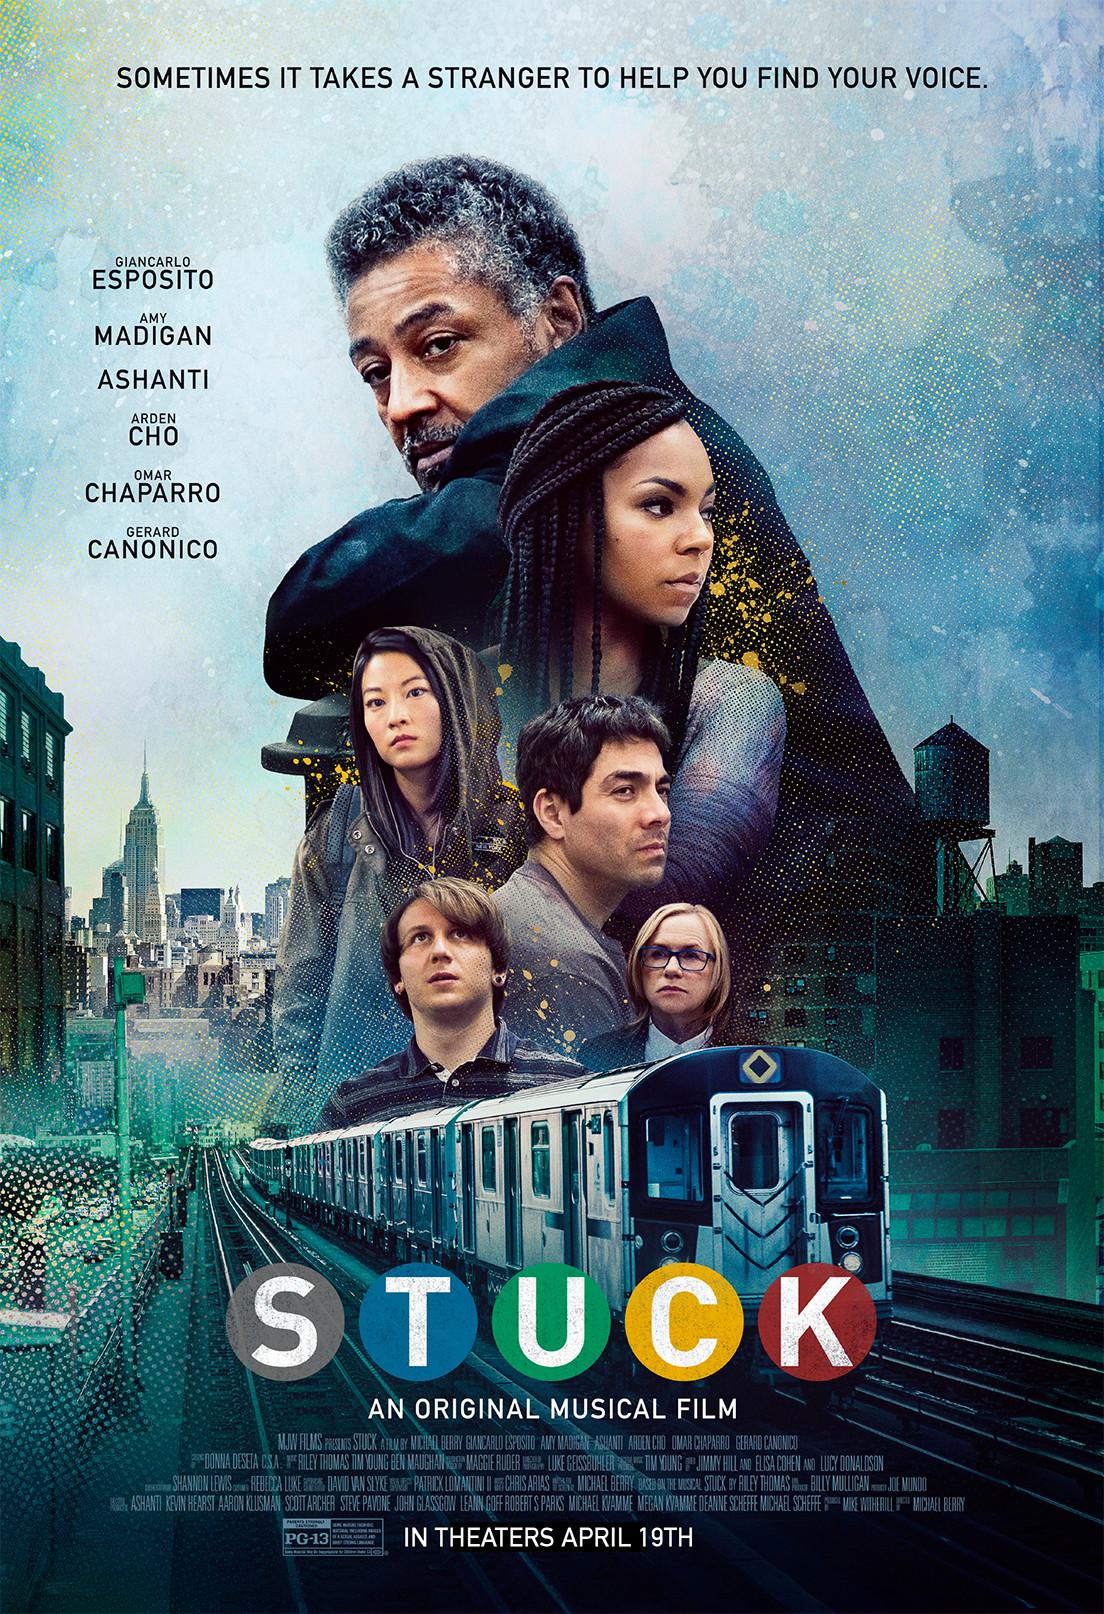 Stuck (2019) Details and Credits - Metacritic